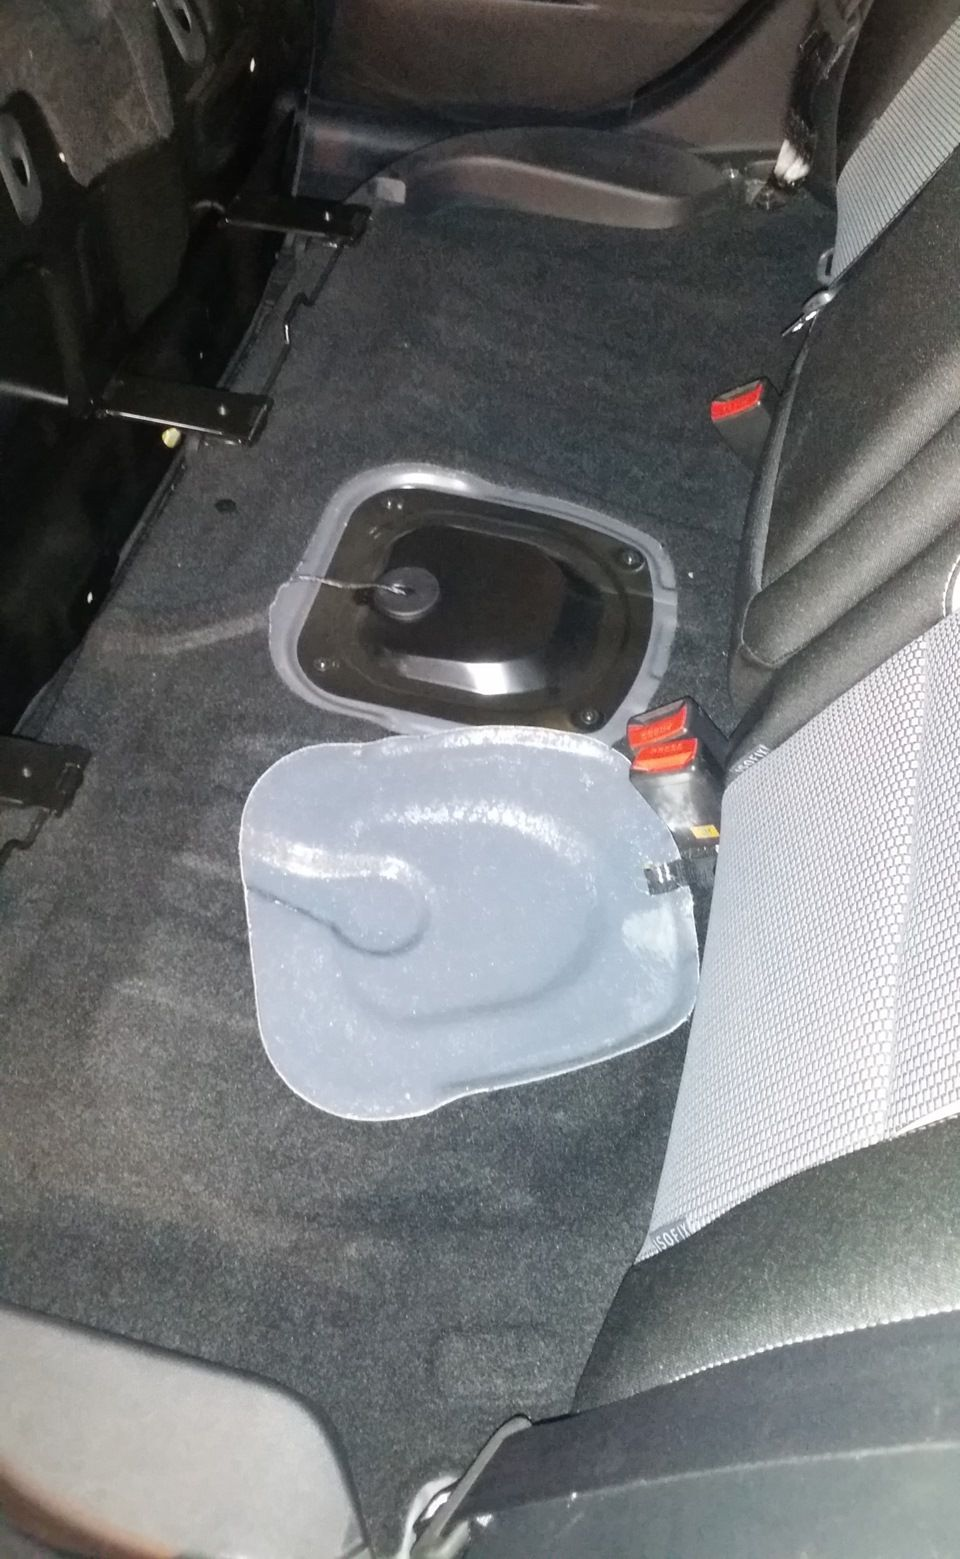 Замена топливного фильтра на автомобиле Kia Ceed